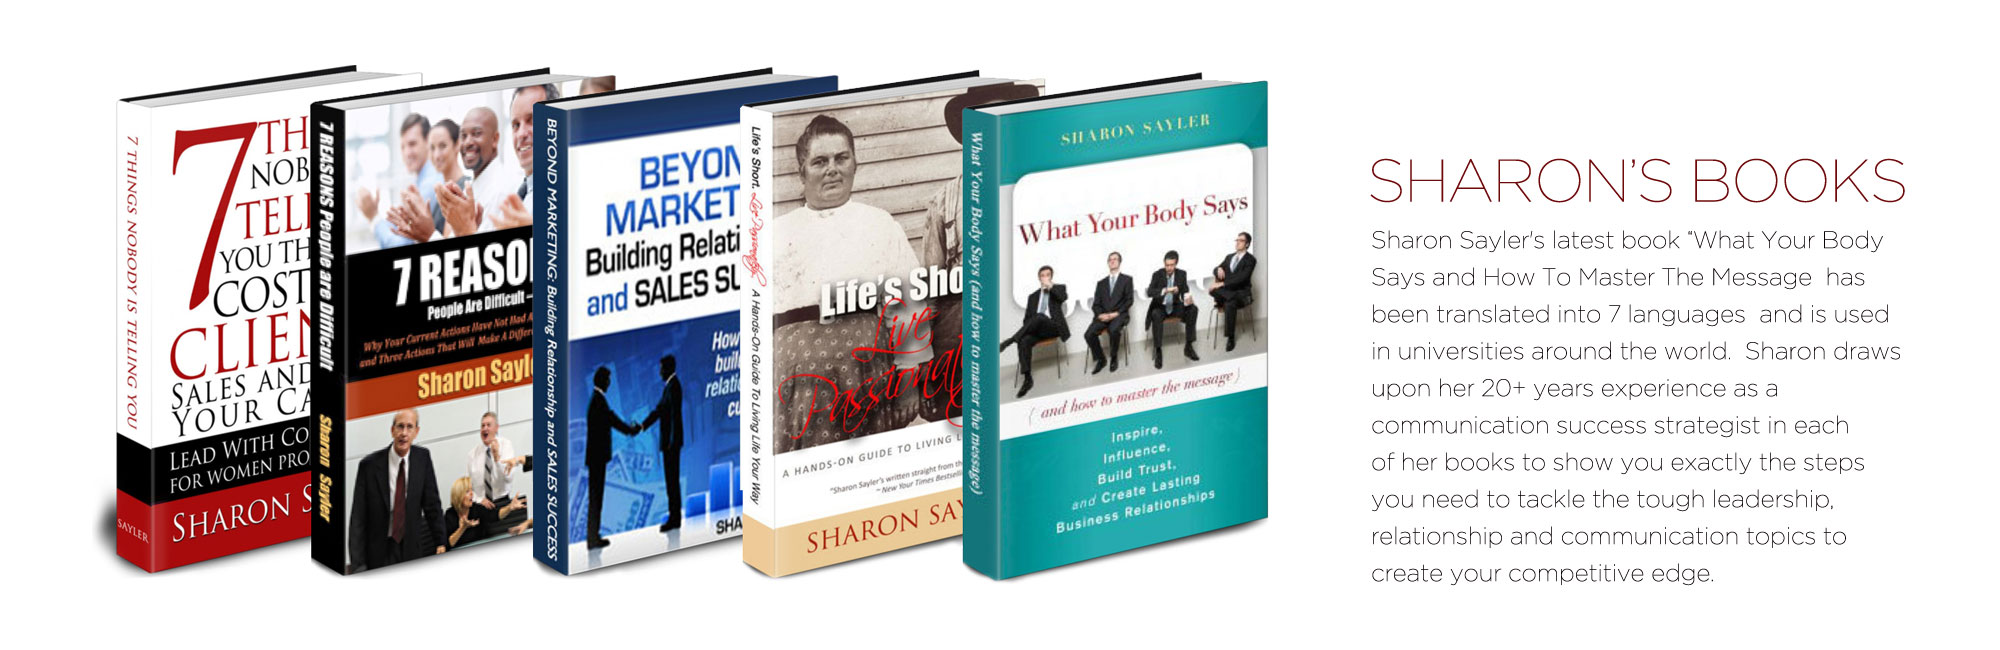 BooksSlider-5mergedbooks